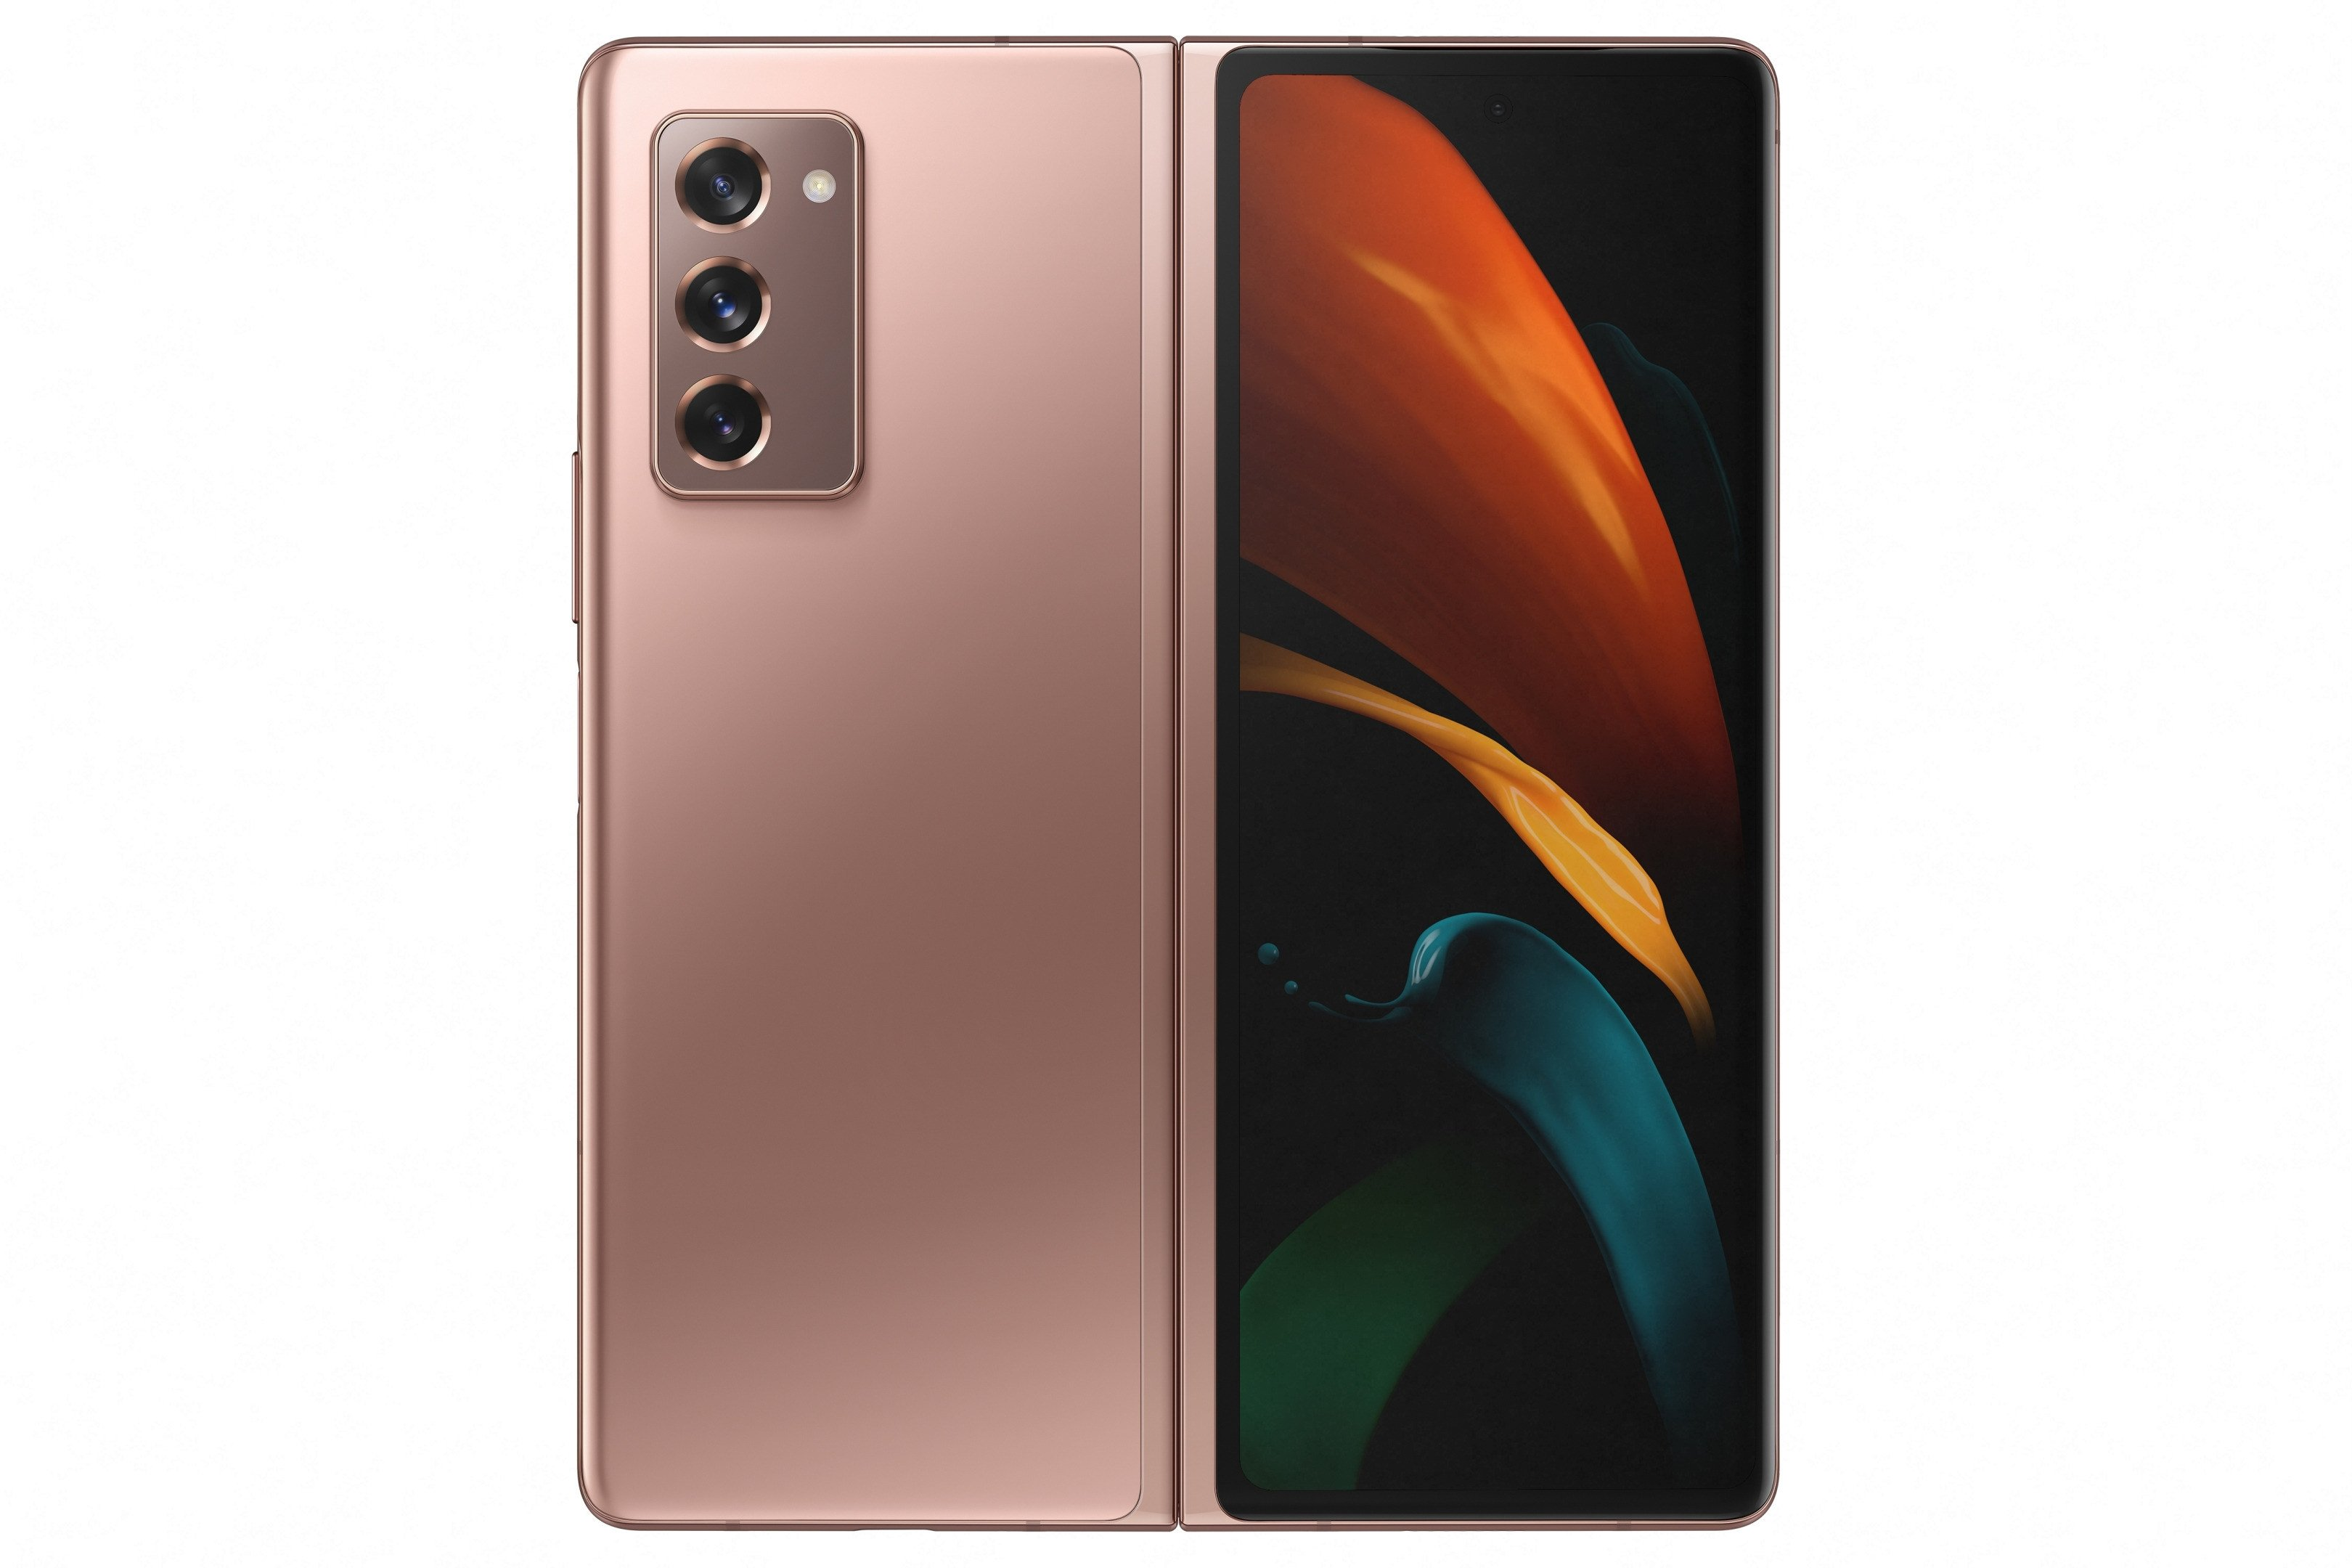 smartfon Samsung Galaxy Z Fold 2 5G smartphone